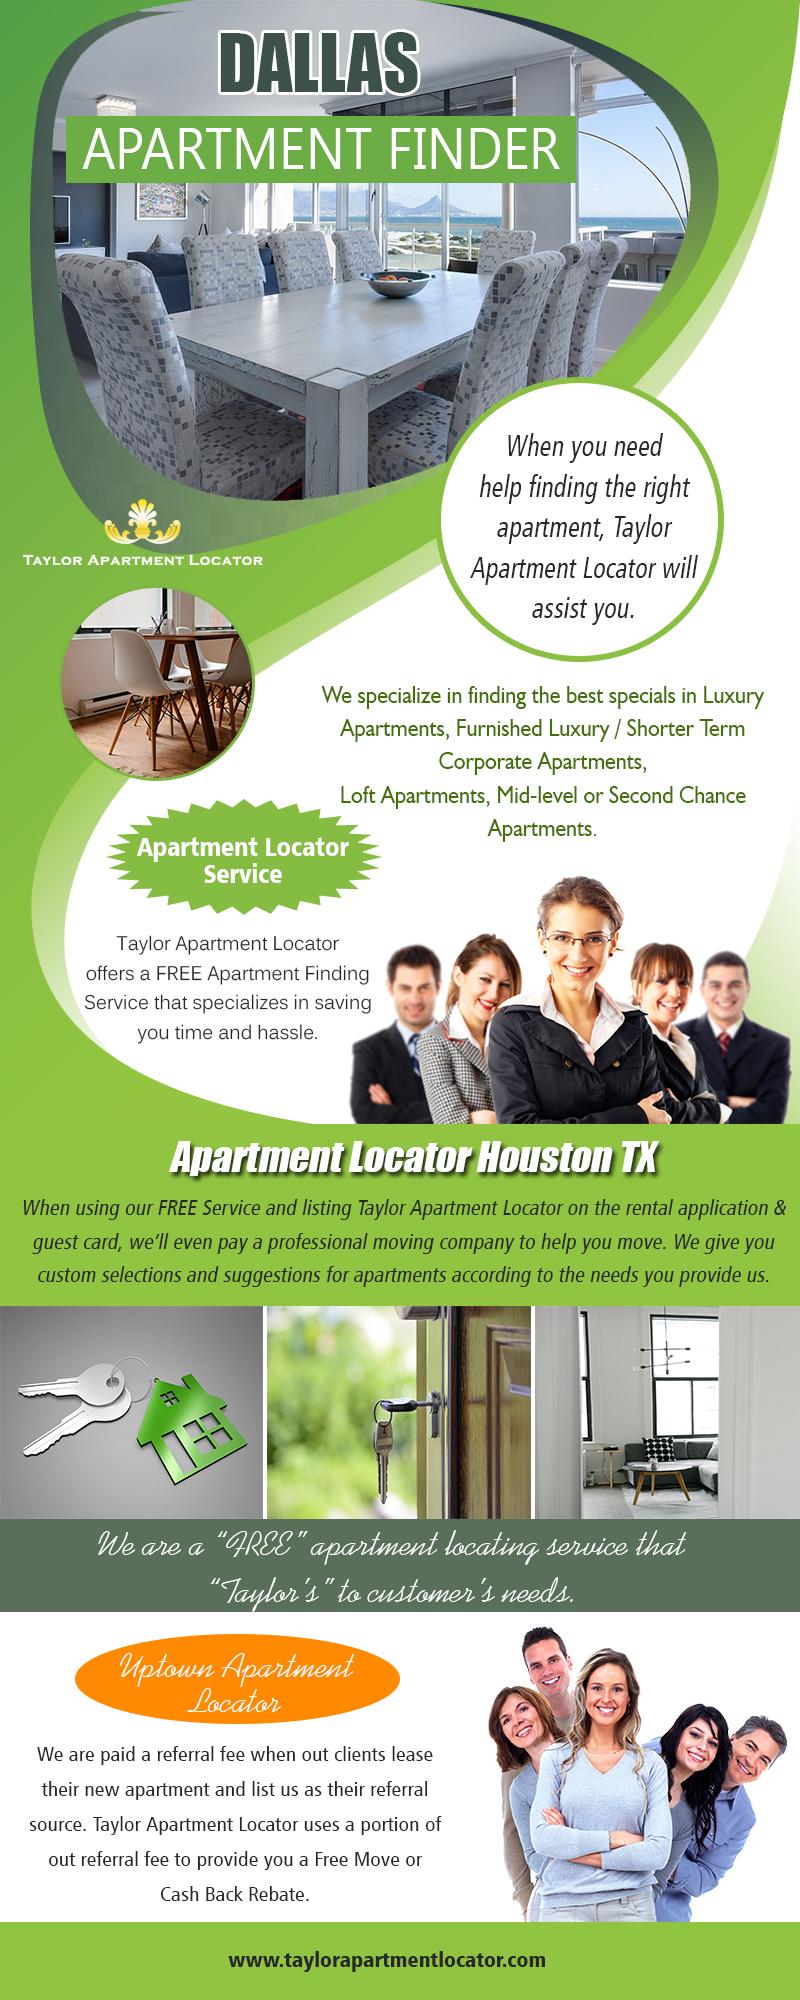 Dallas Apartment Finder | 2146249892 | taylorapartmentlocator.com